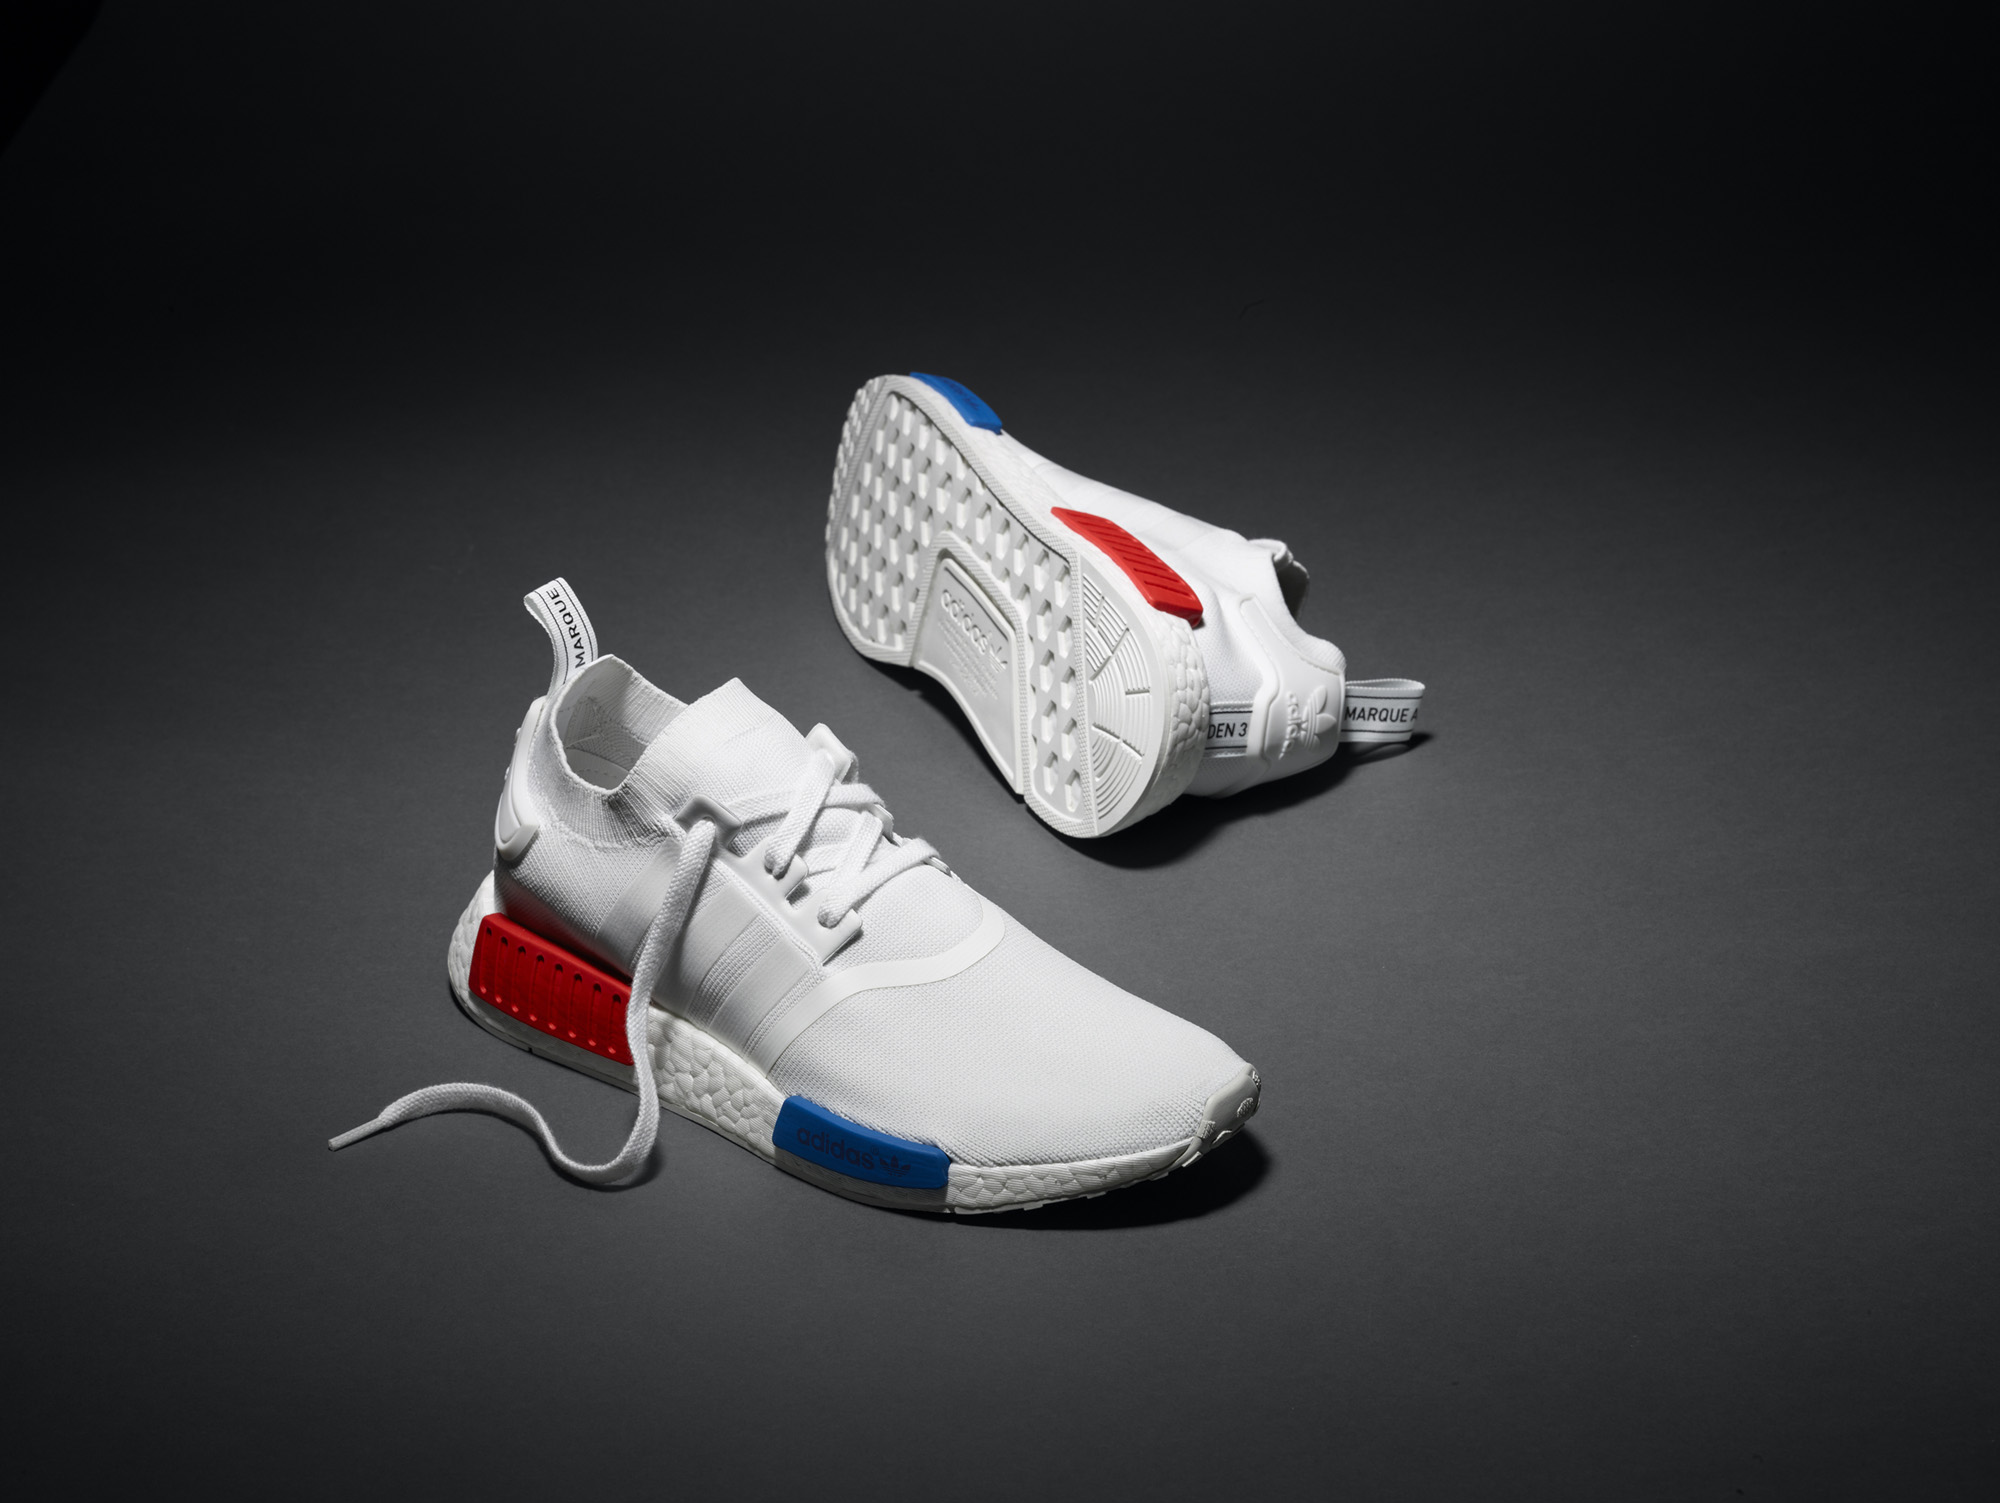 Adidas Nmd Runner Pk Precio